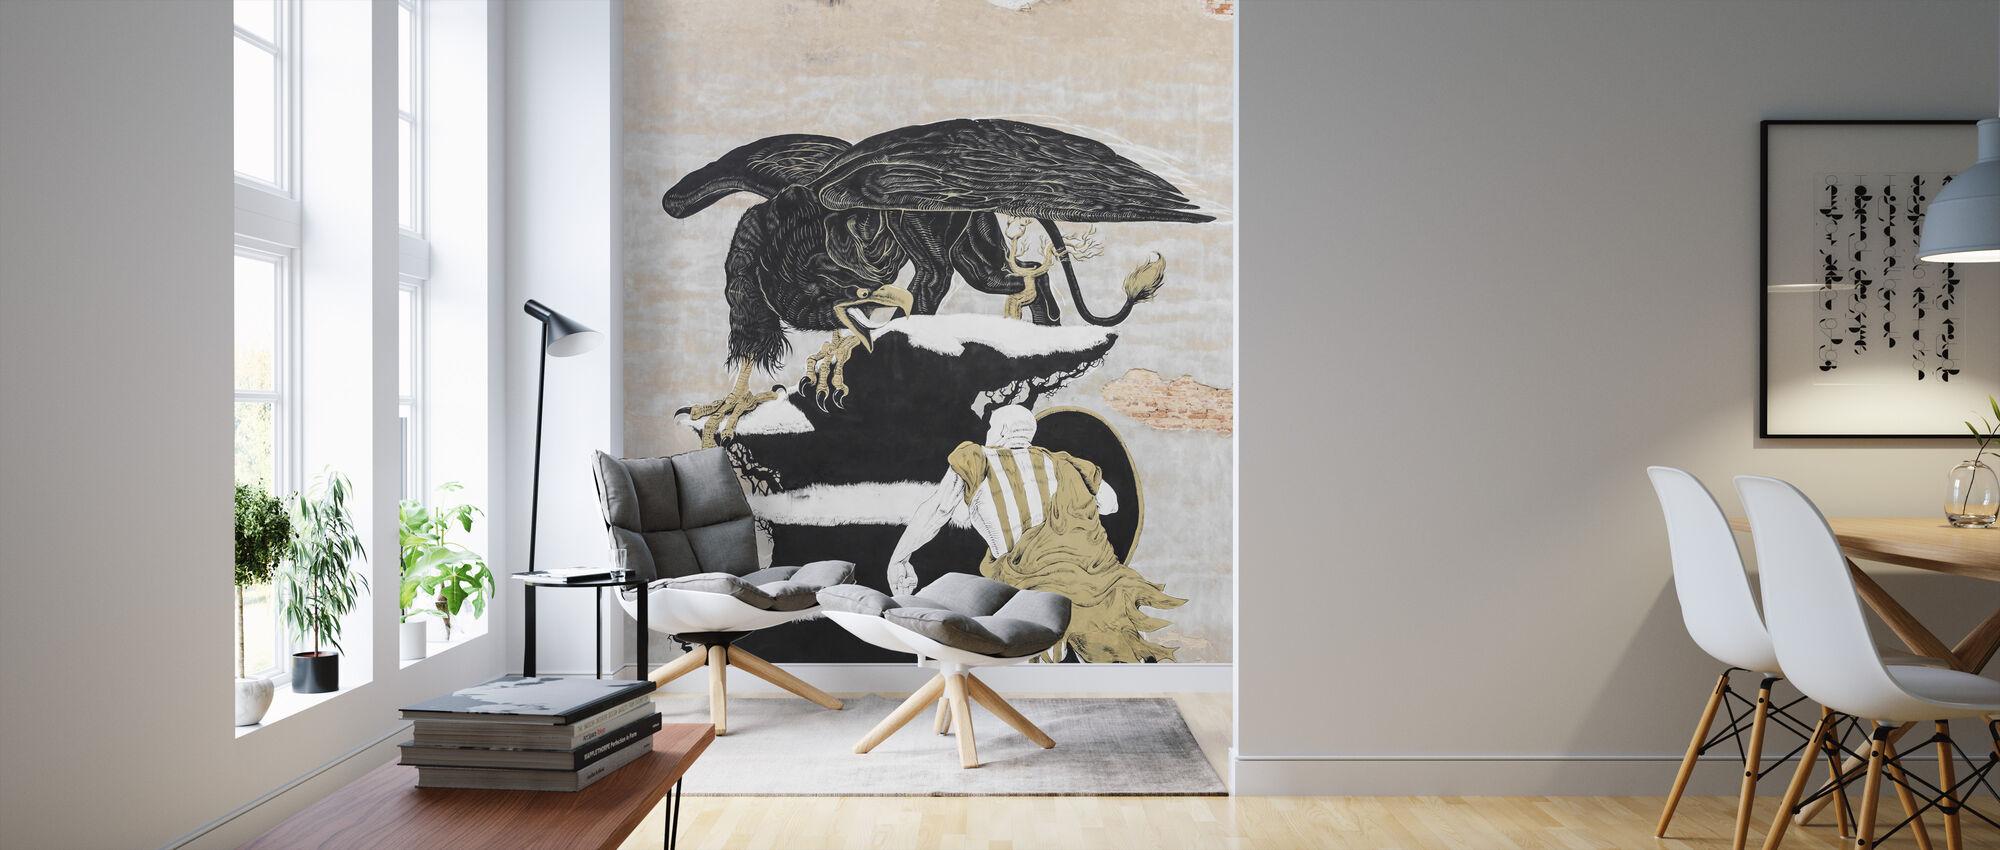 Street Art Painting - Wallpaper - Living Room